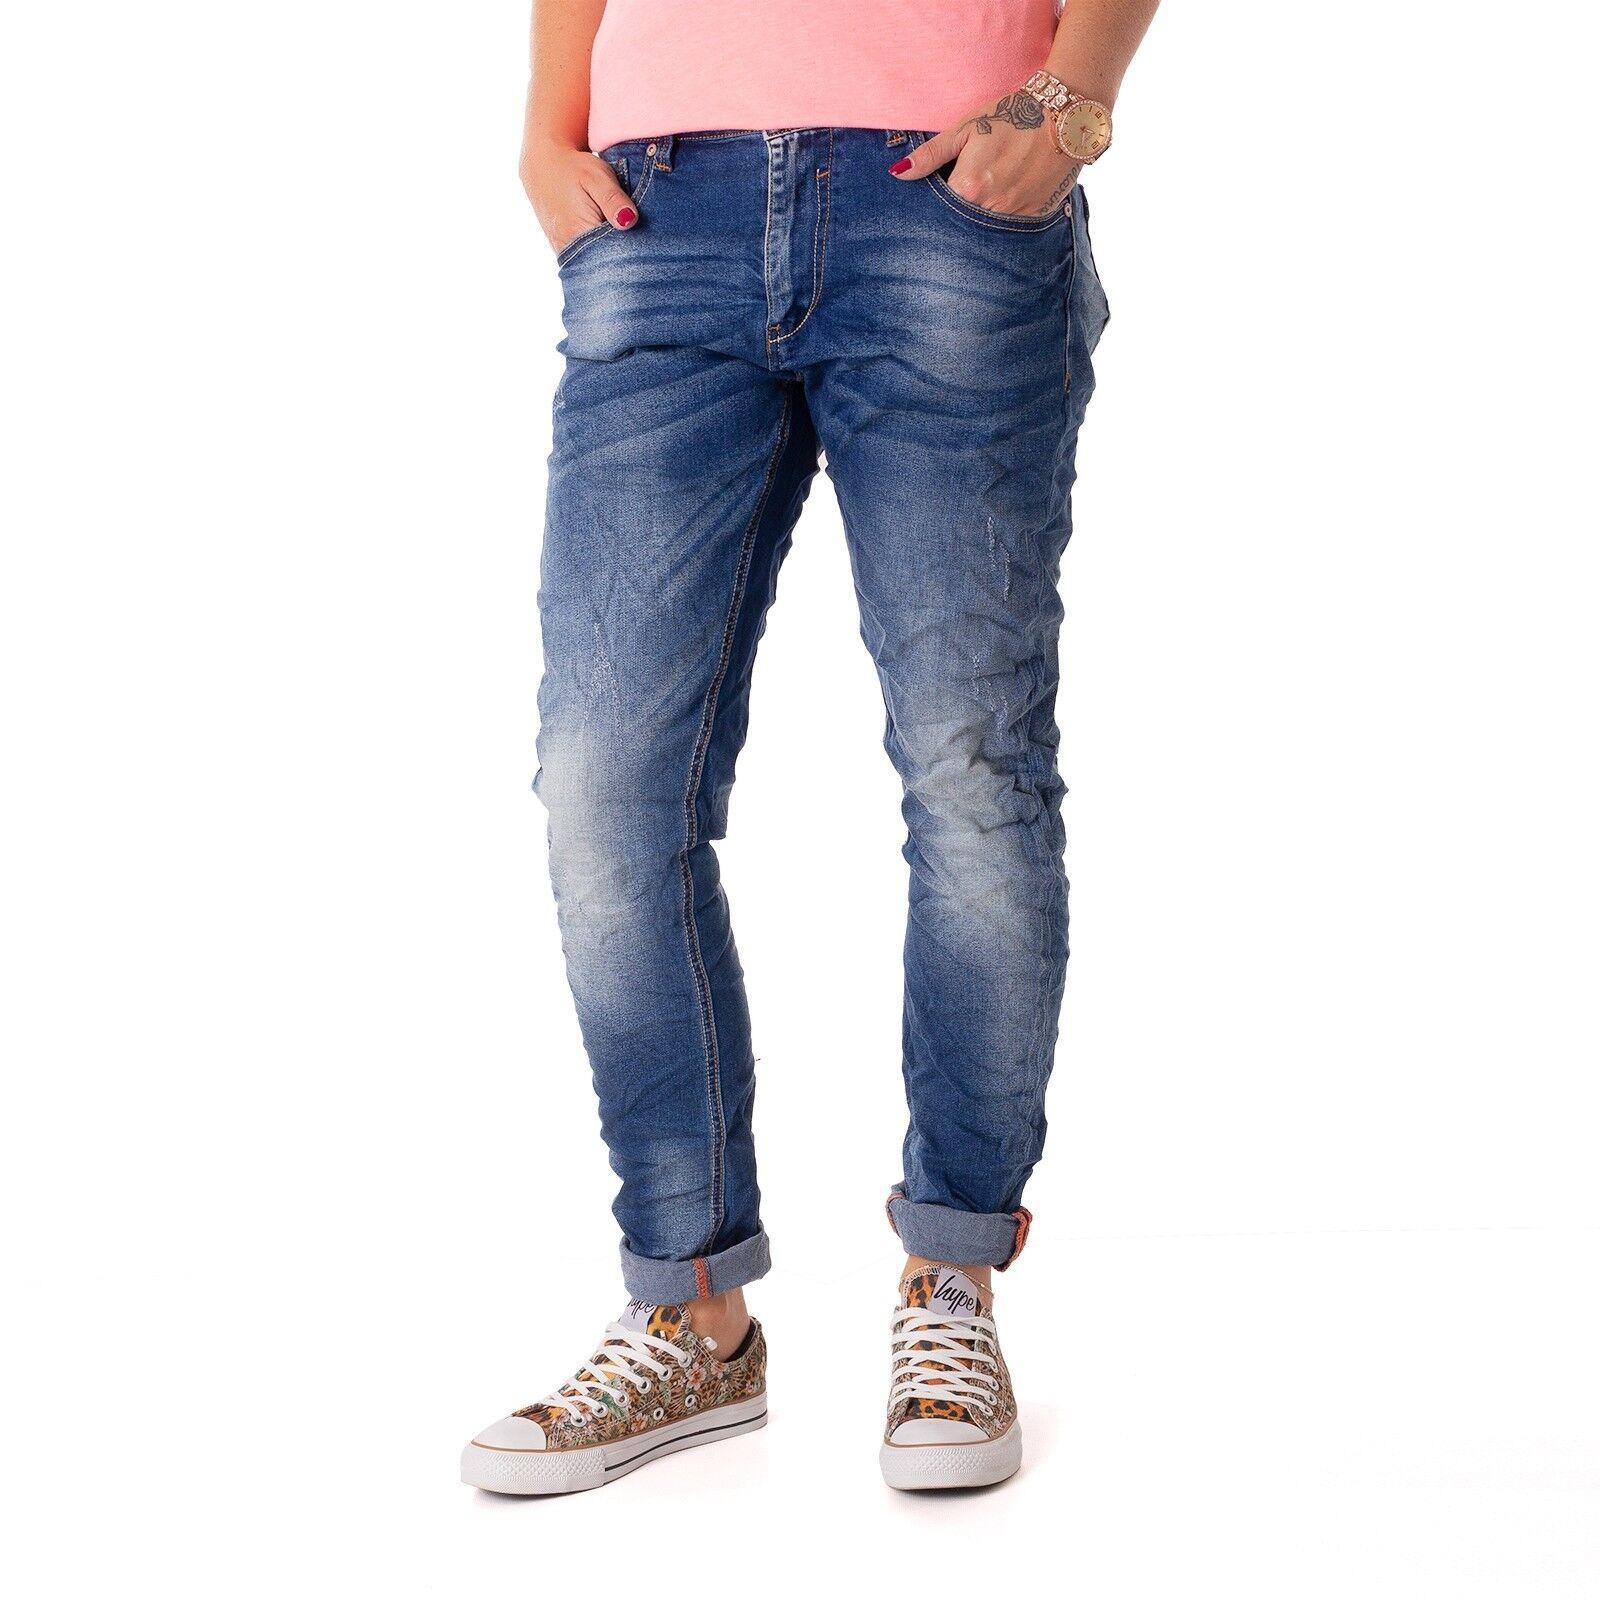 MODA DENIM ifth17m246 jeans aderente Pantaloni Donna Donna Donna usedhell 15744 2a103e